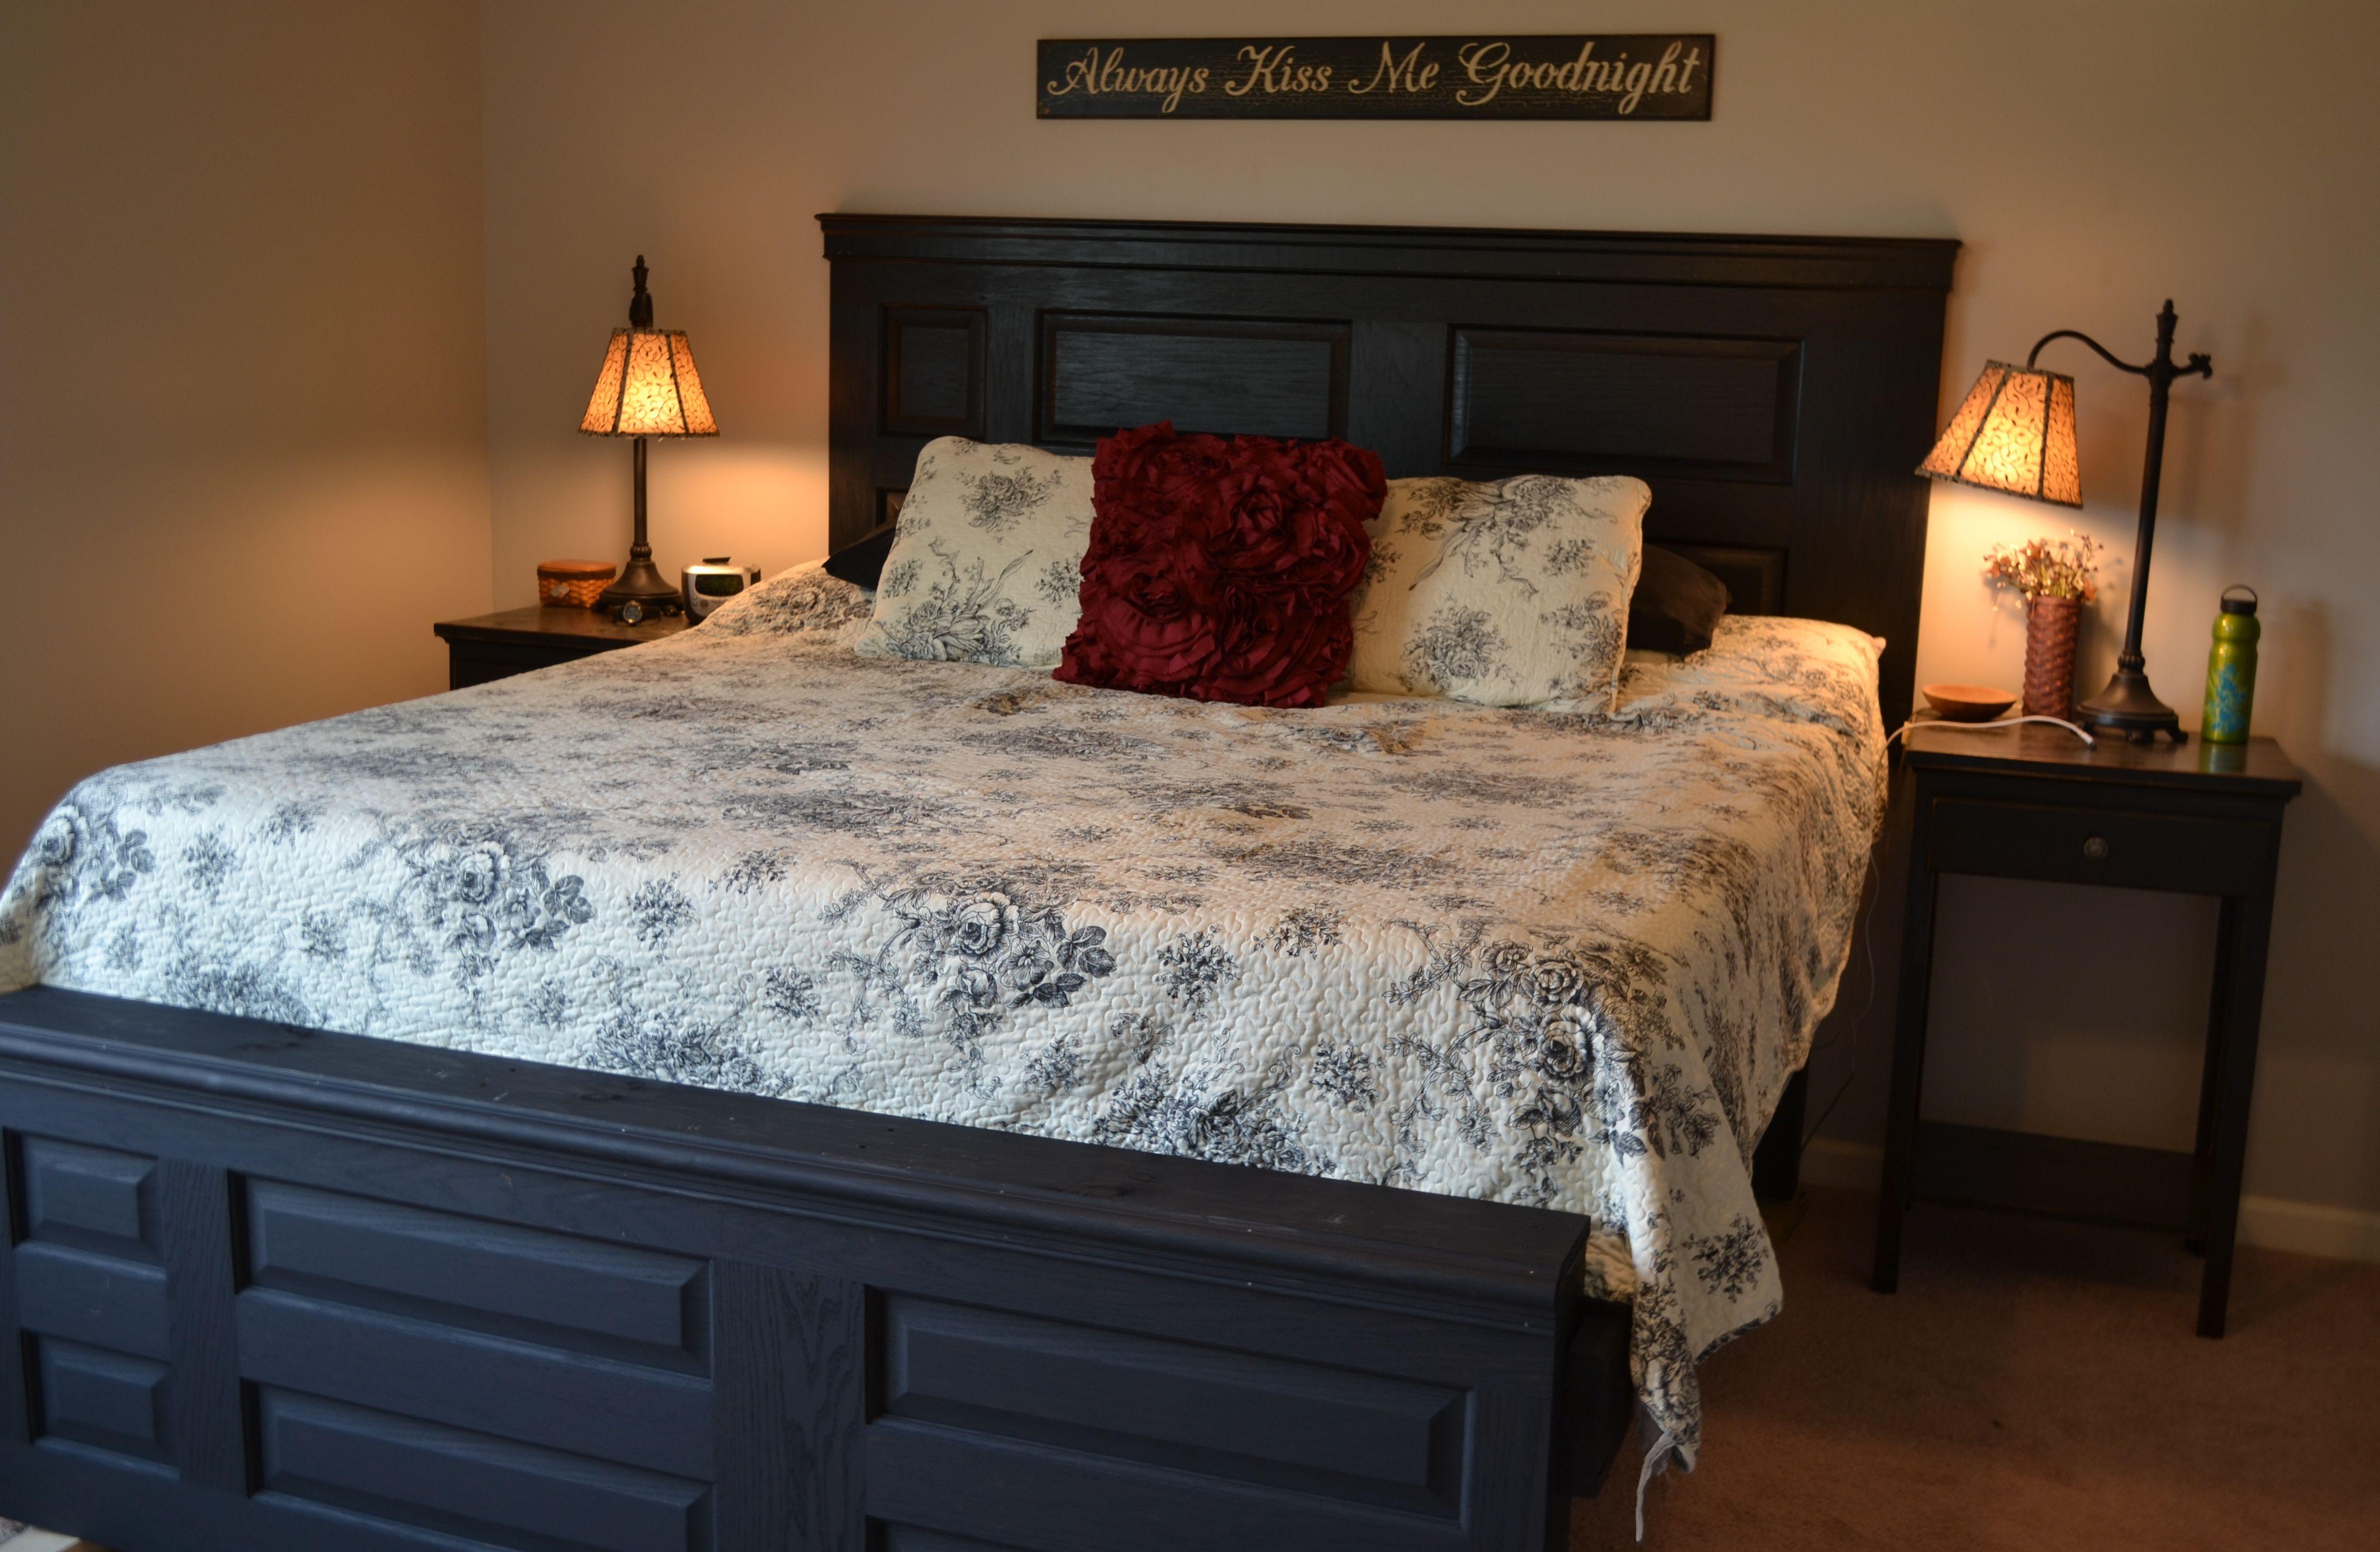 Door Headboard And Footboard, Crown Molding, Bedroom